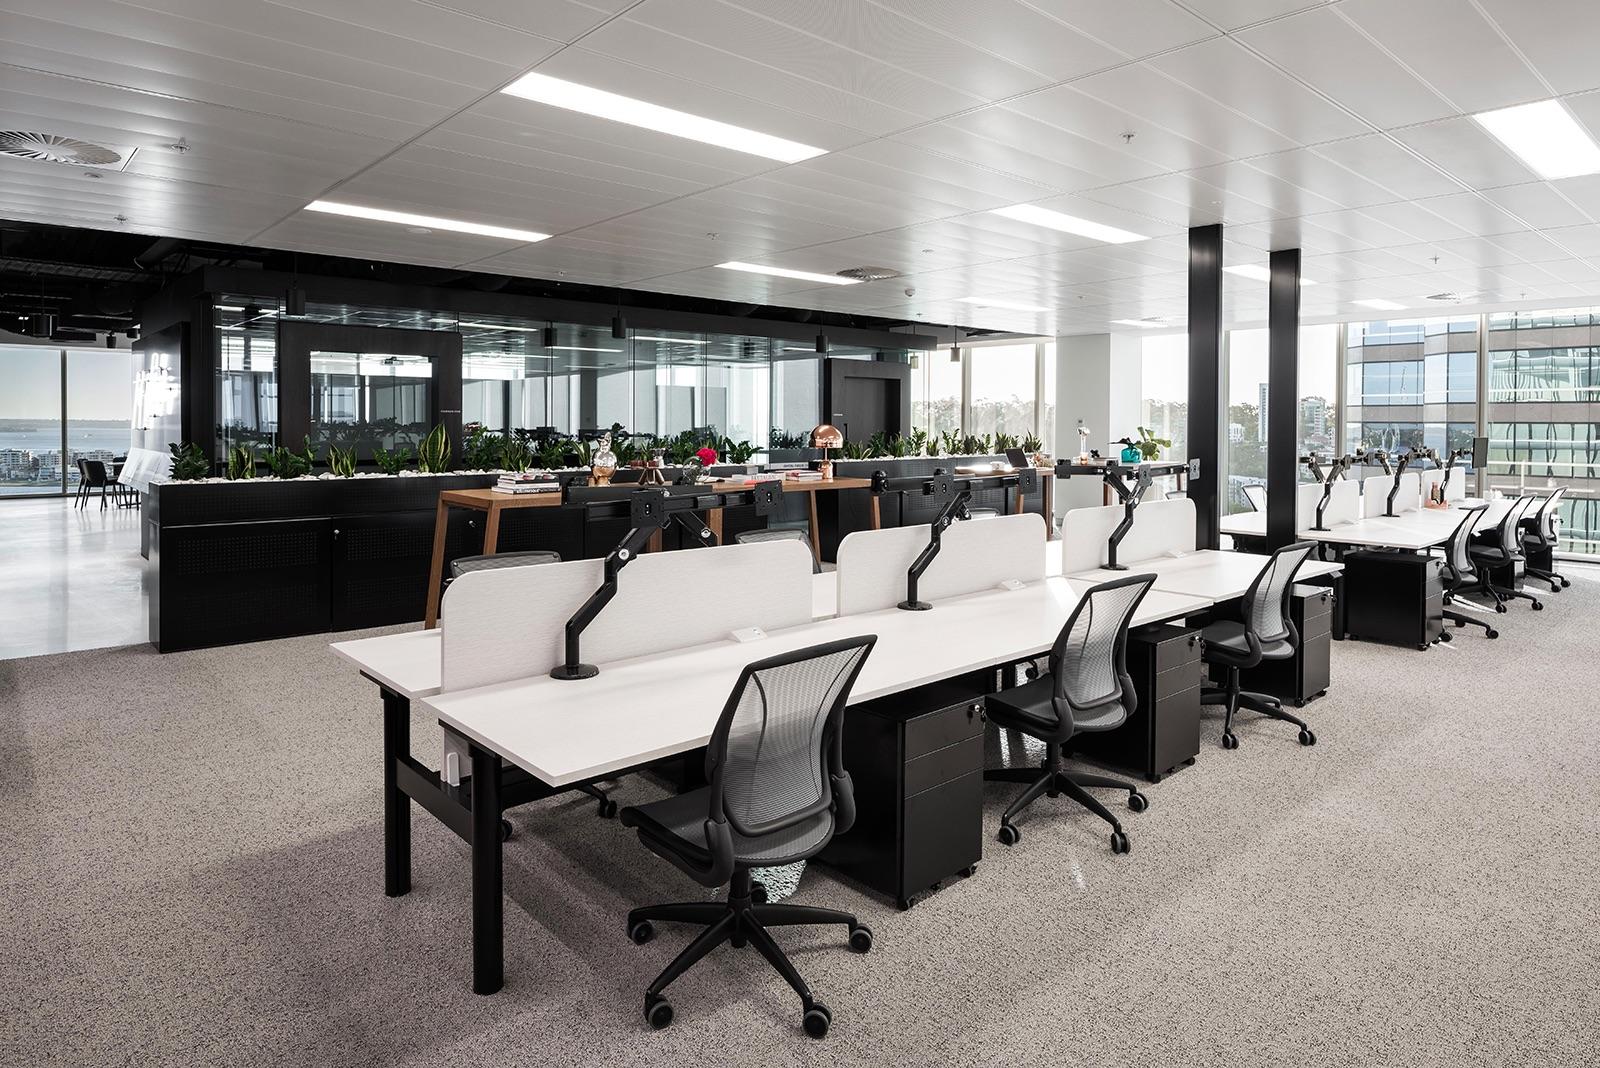 dentsu-aegis-network-office-11